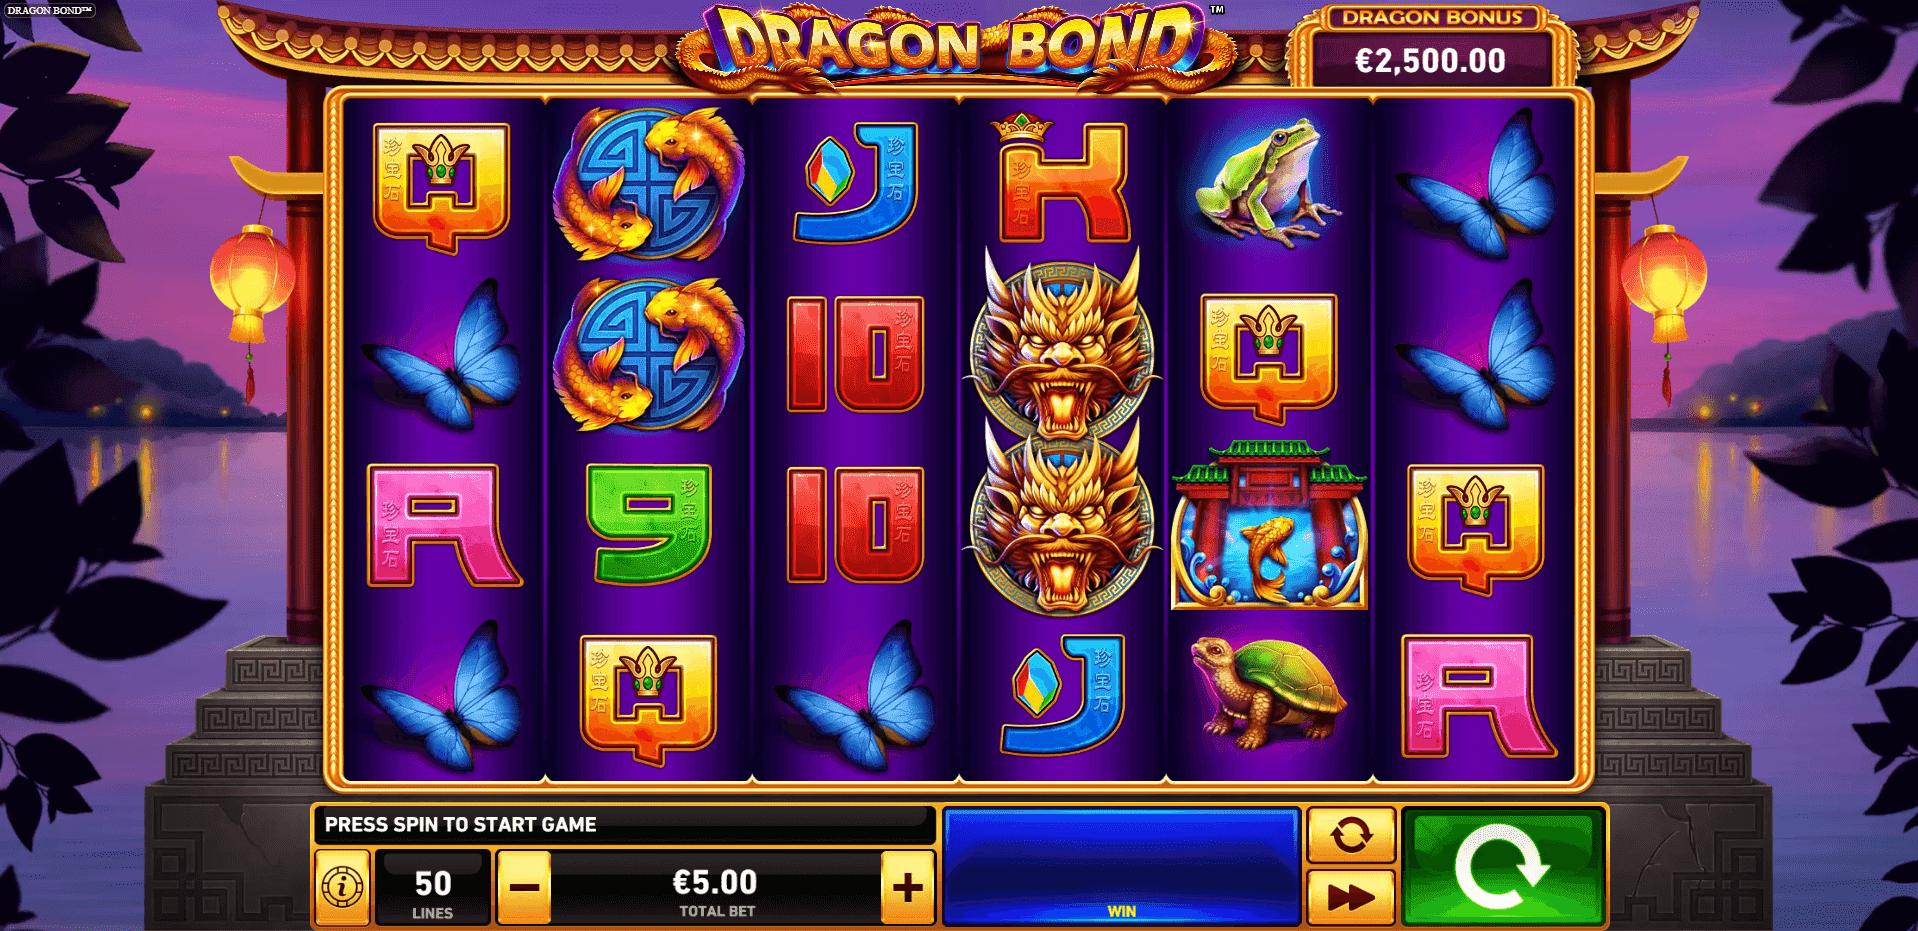 Dragon Bond slot machine screenshot